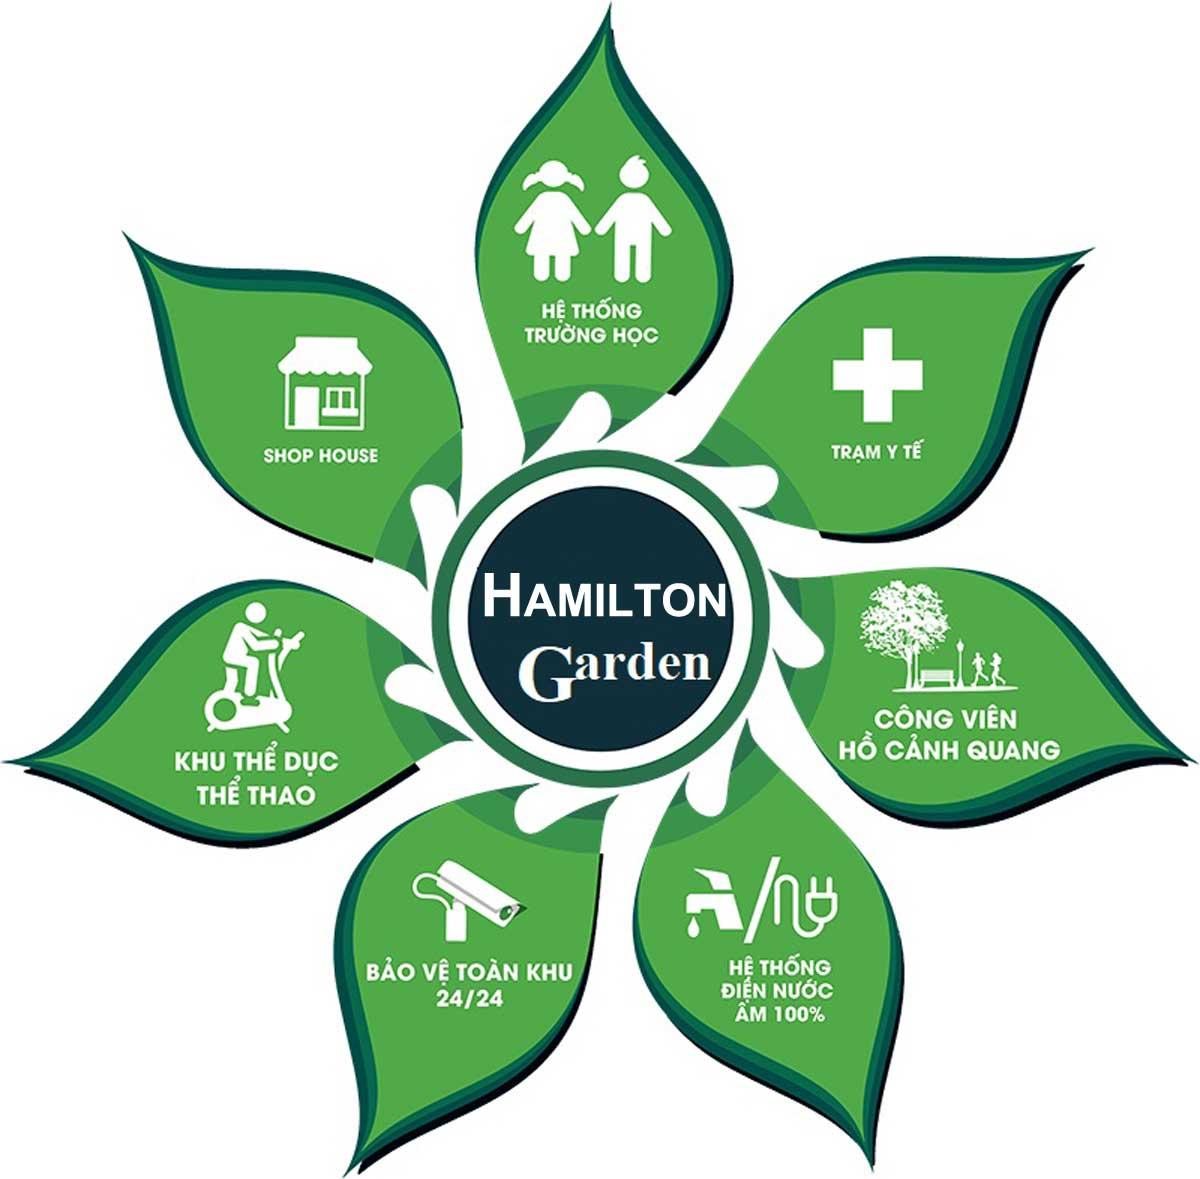 He thong tien ich noi khu du an Hamilton Garden - HAMILTON GARDEN LONG AN